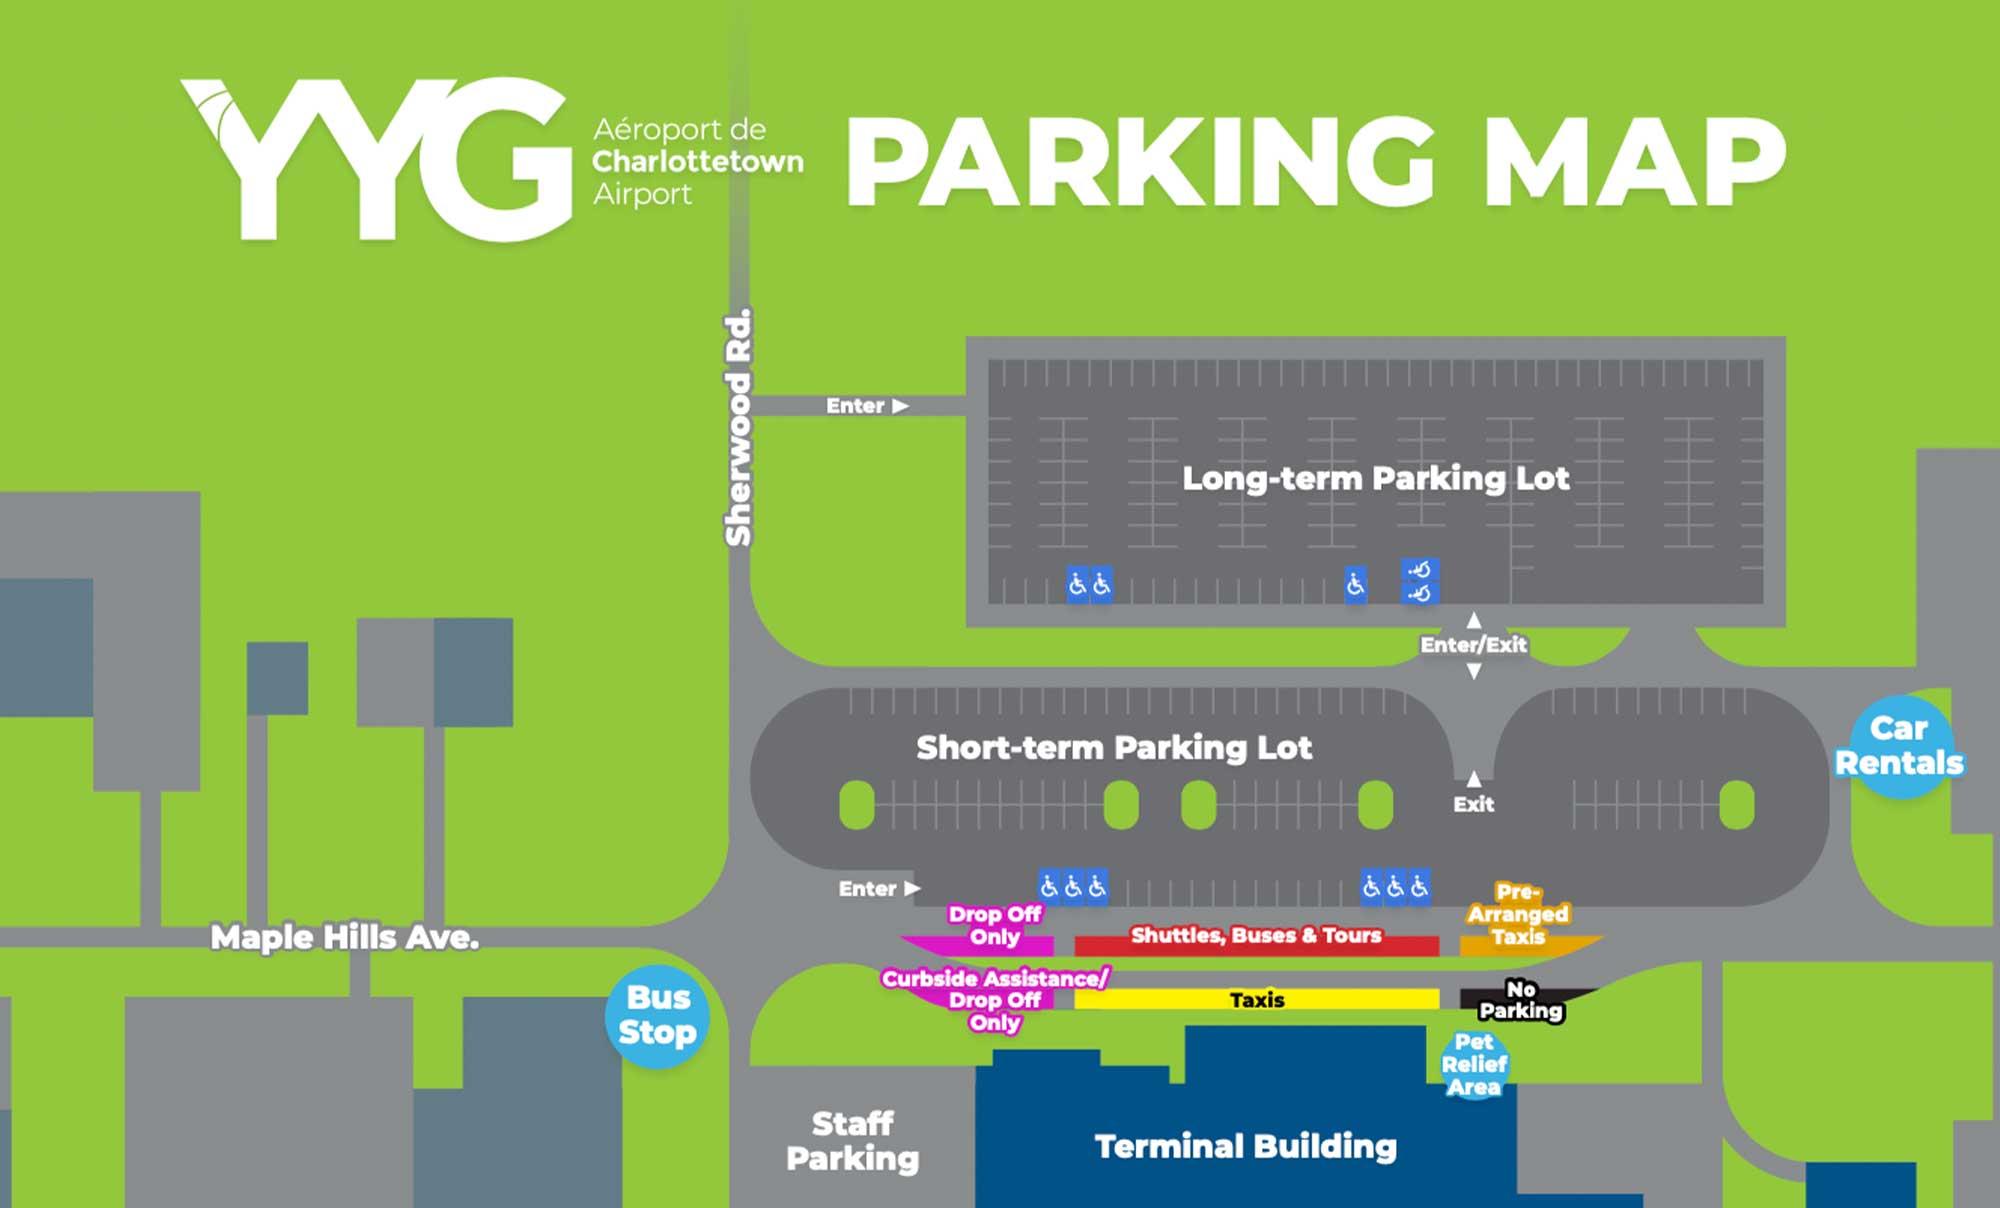 yyg-parking-map